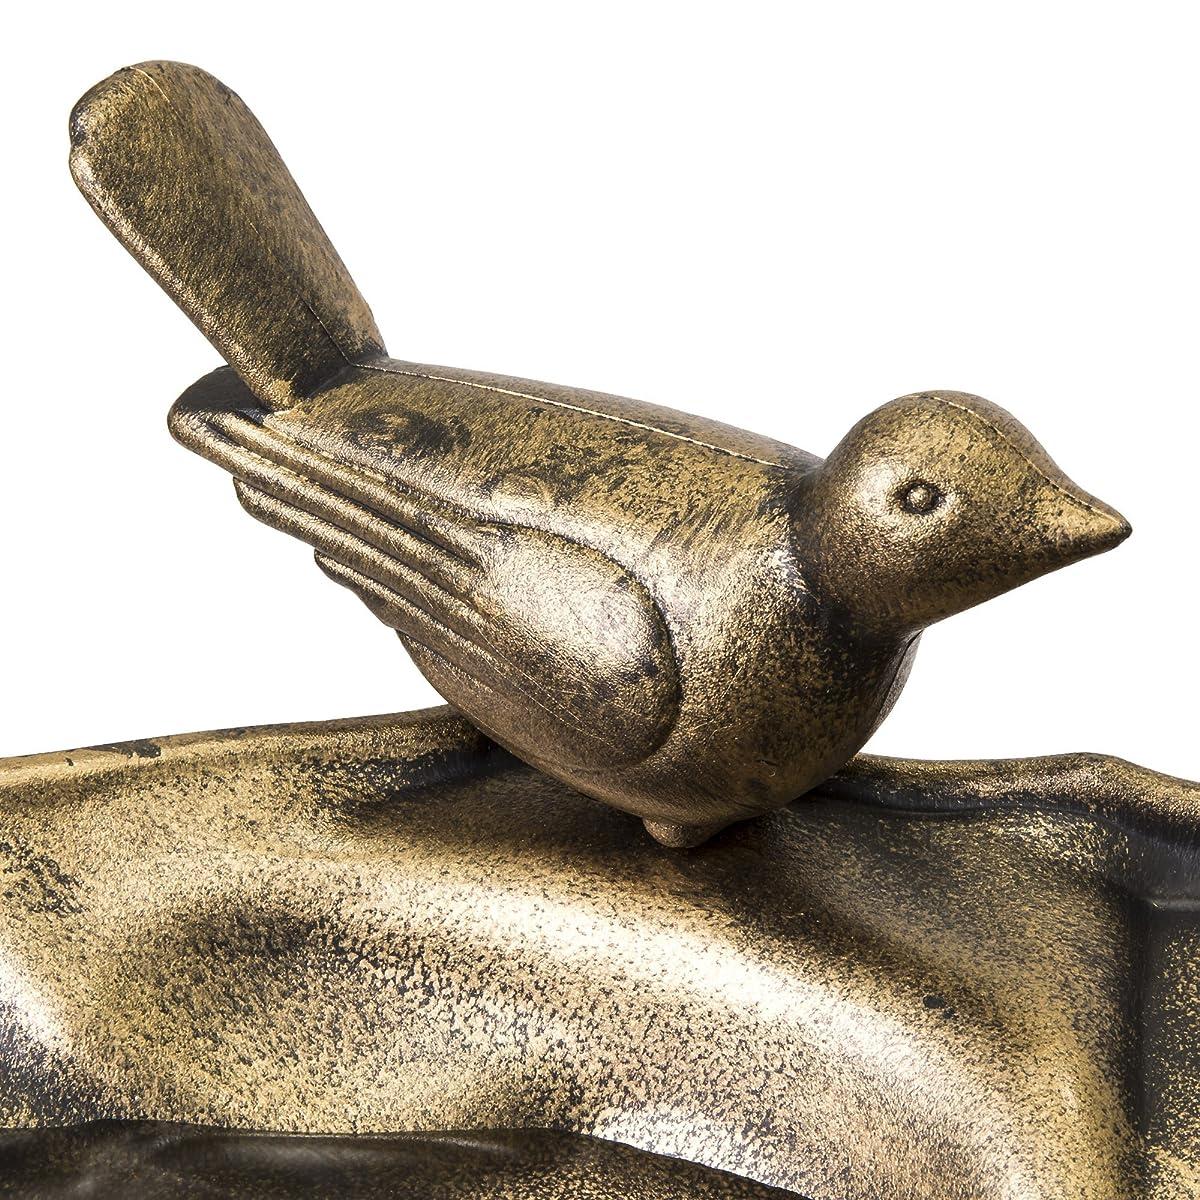 Best Choice Products Pedestal Bird Bath w/Scroll Accent, Sitting Pair of Birds - Antique Gold